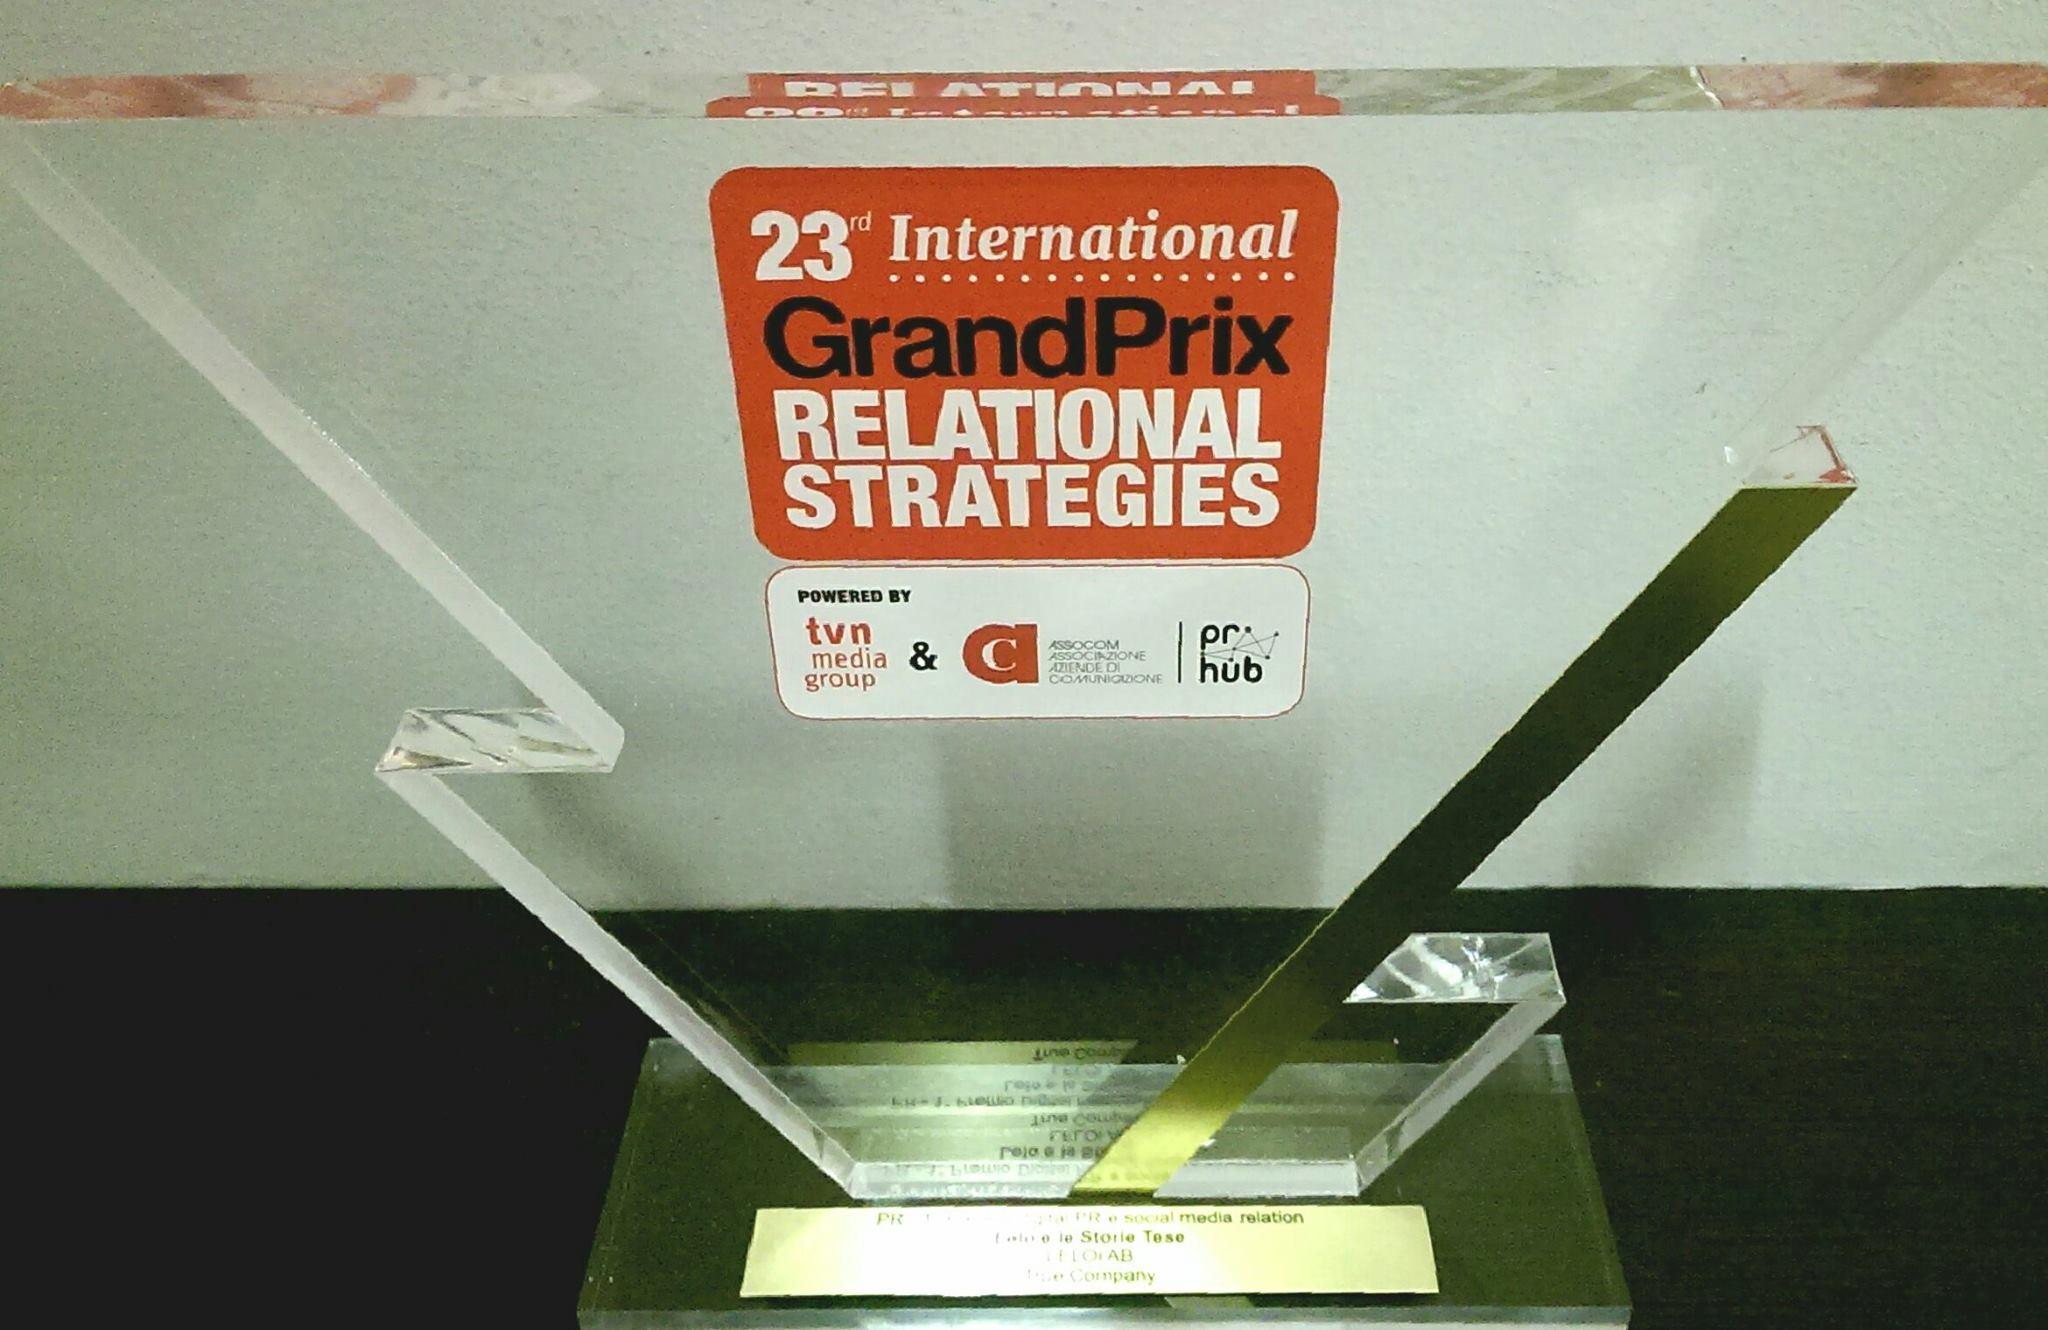 digital-pr-e-social-media-relation_premio